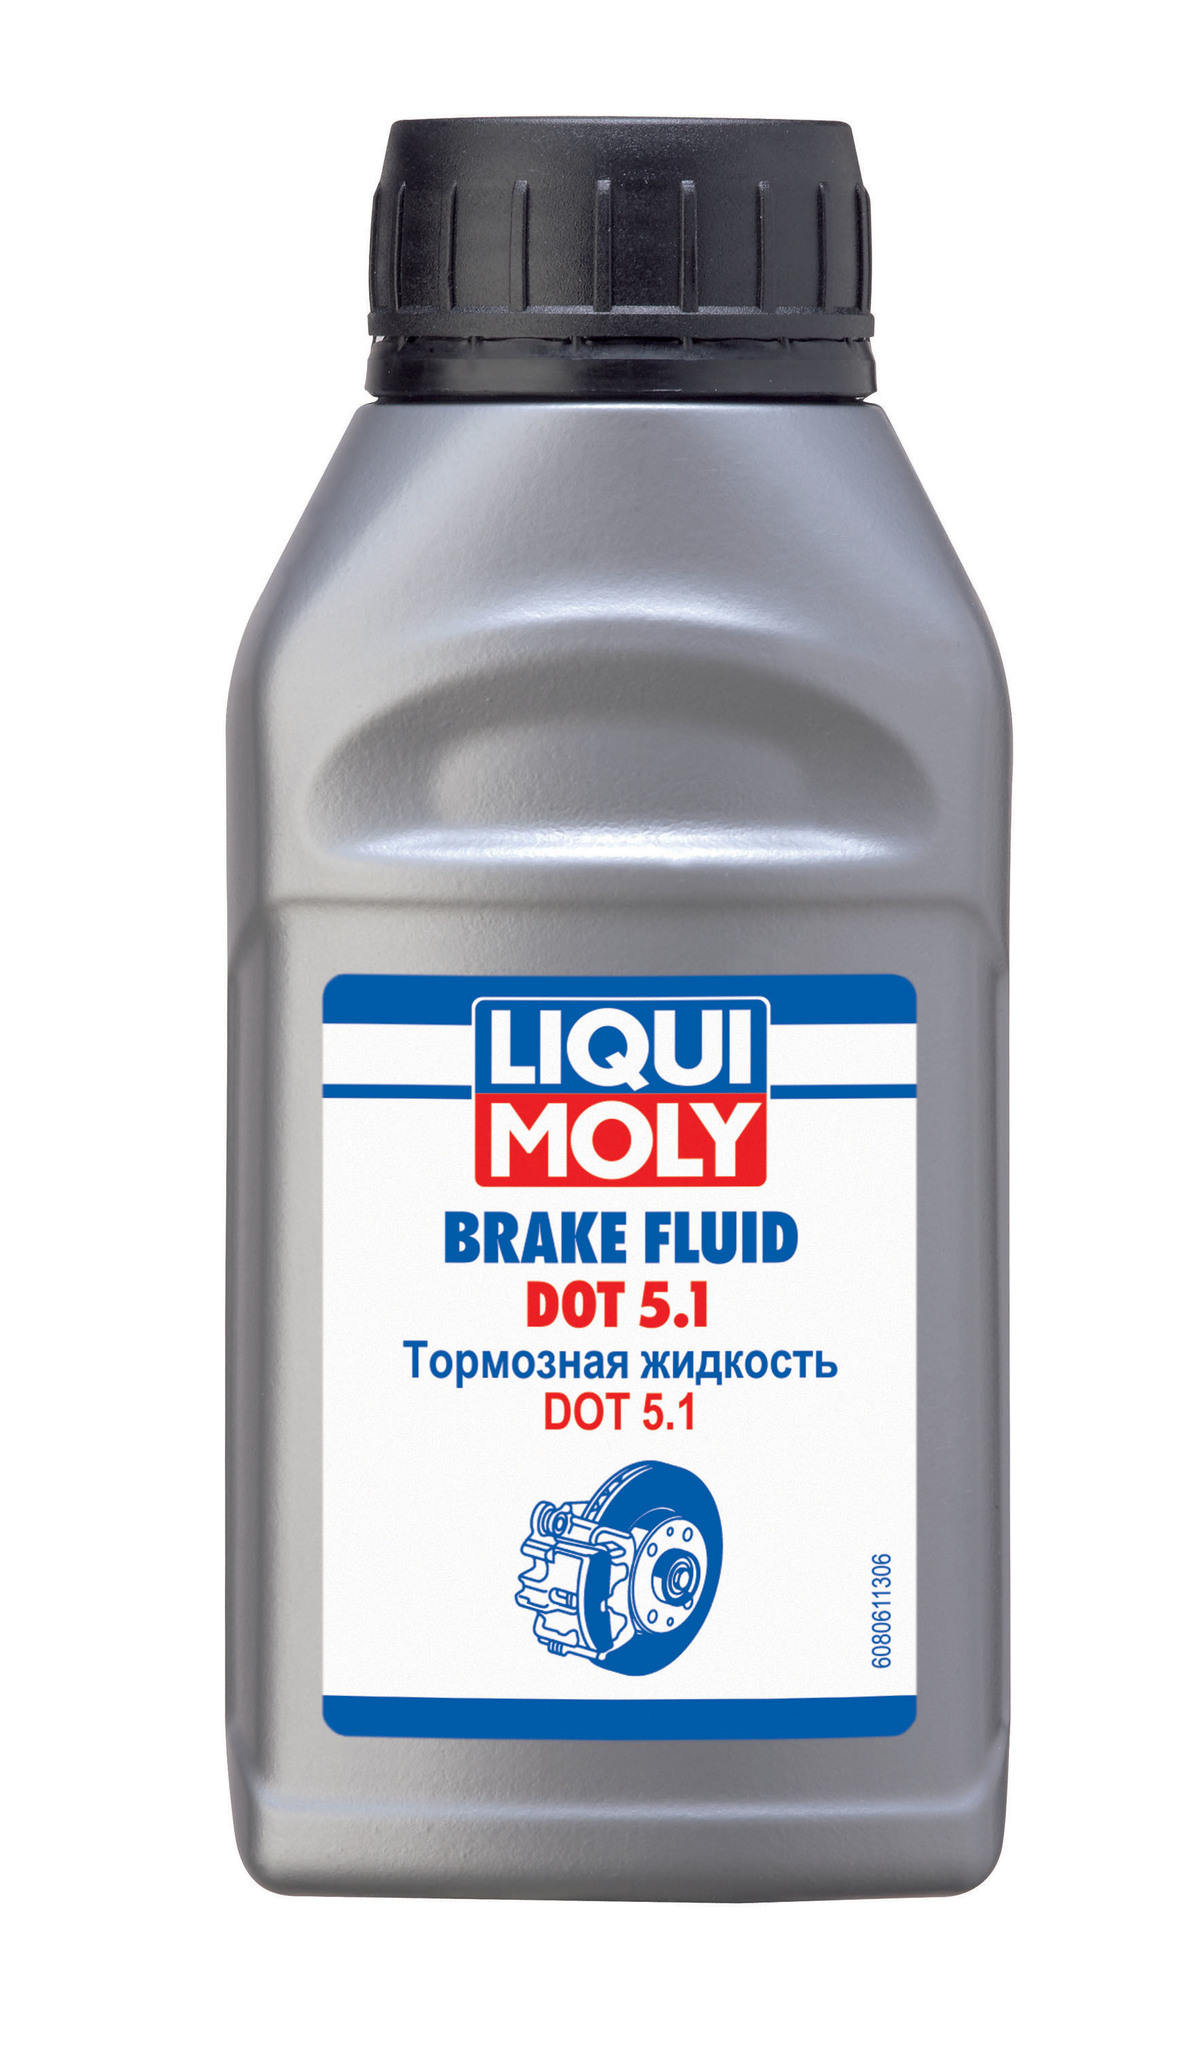 Liqui Moly Brake Fluid DOT 5.1 (0,25л) - Тормозная жидкость